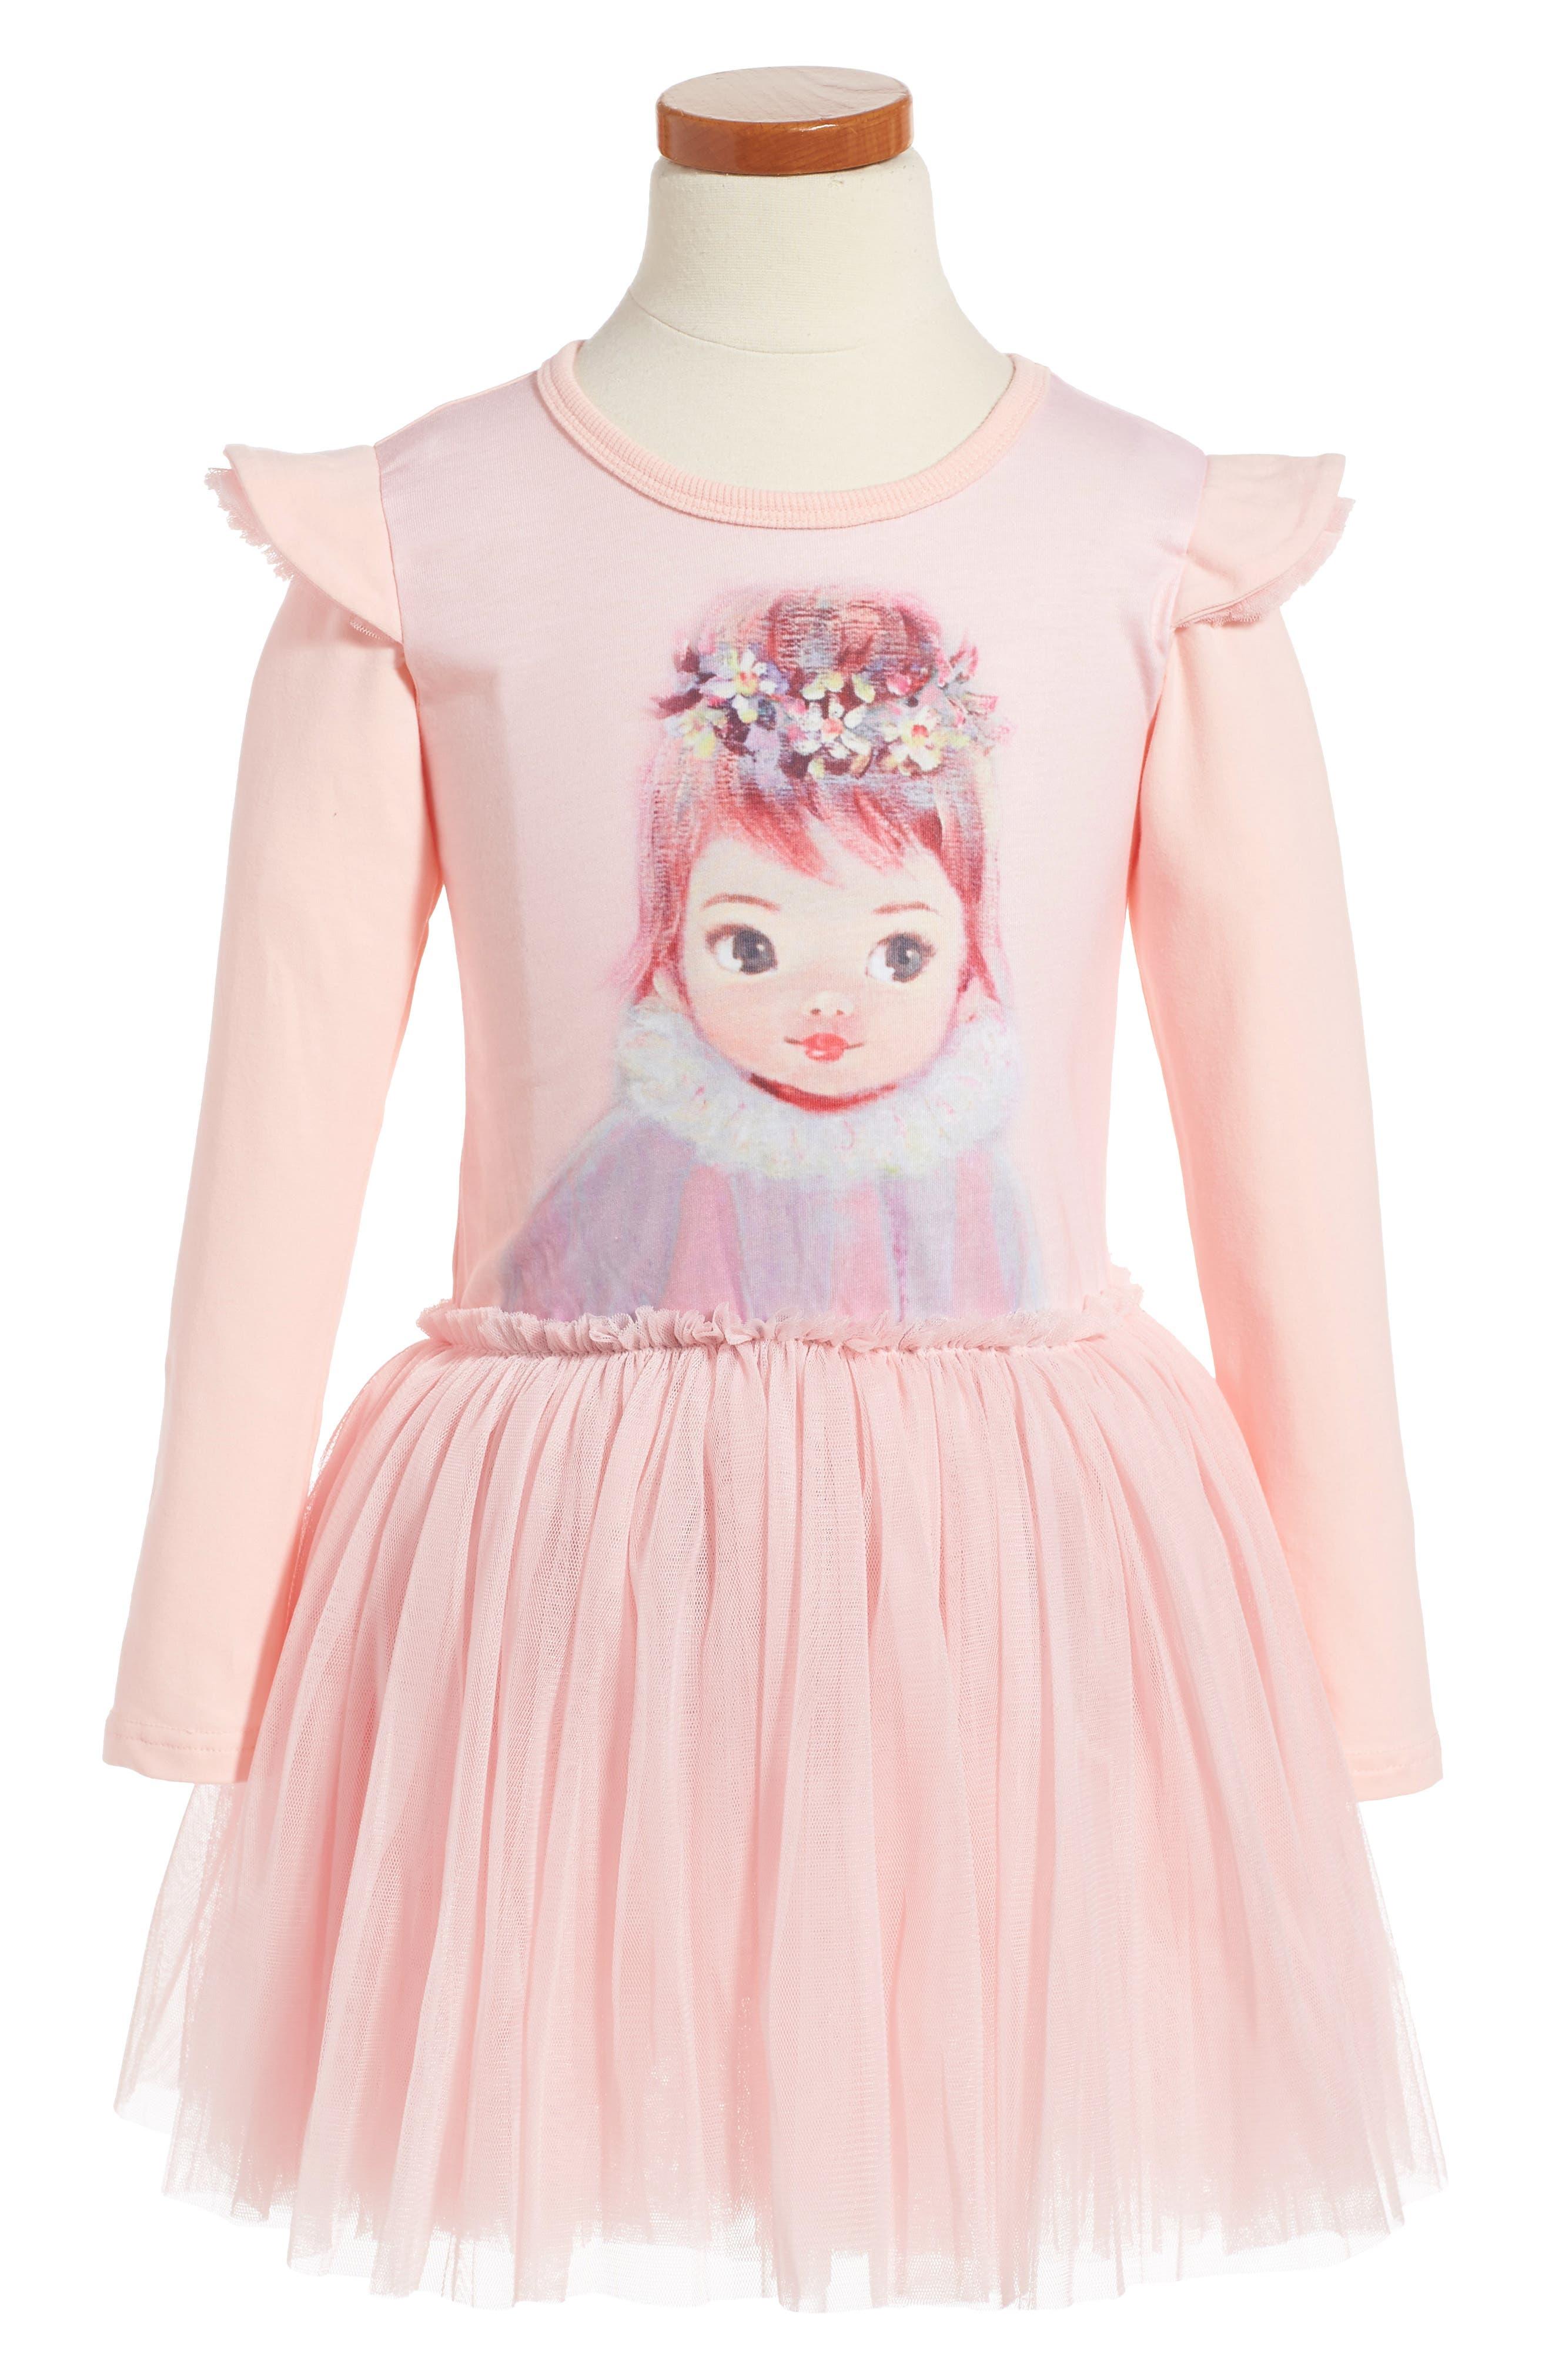 Main Image - Rock Your Kid Harlequin Circus Dress (Toddler Girls & Little Girls)